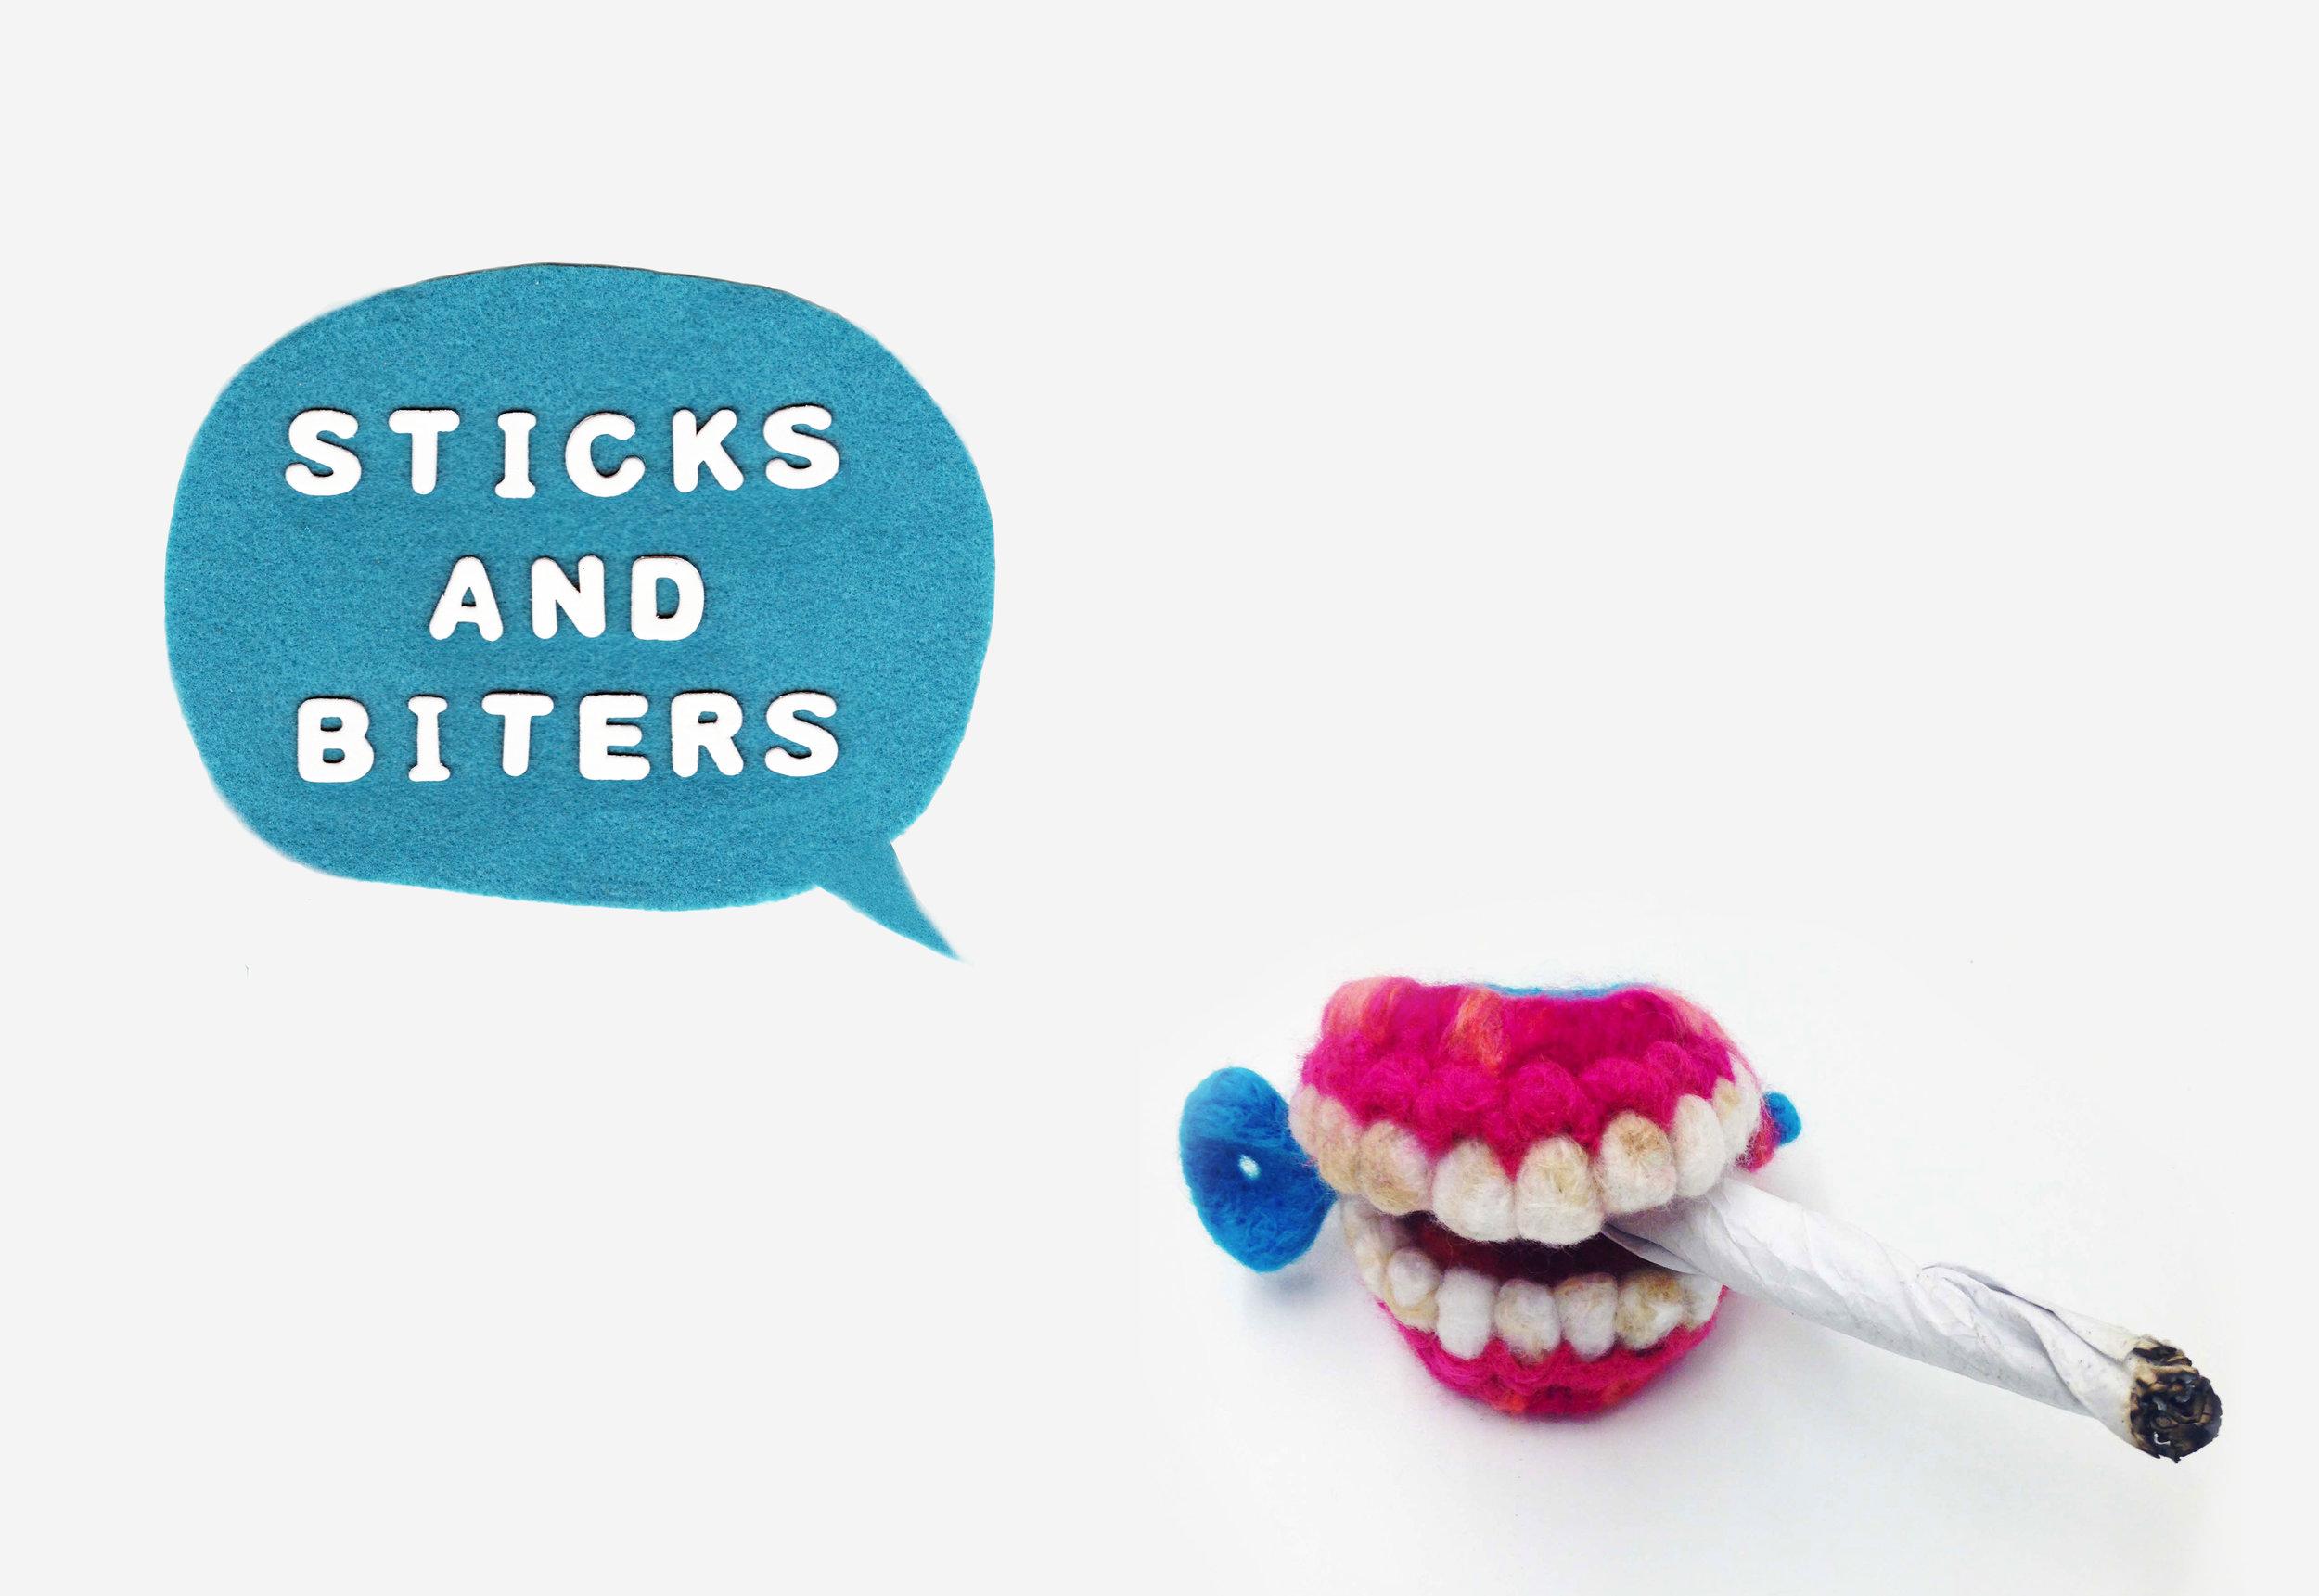 Sticks and Biters